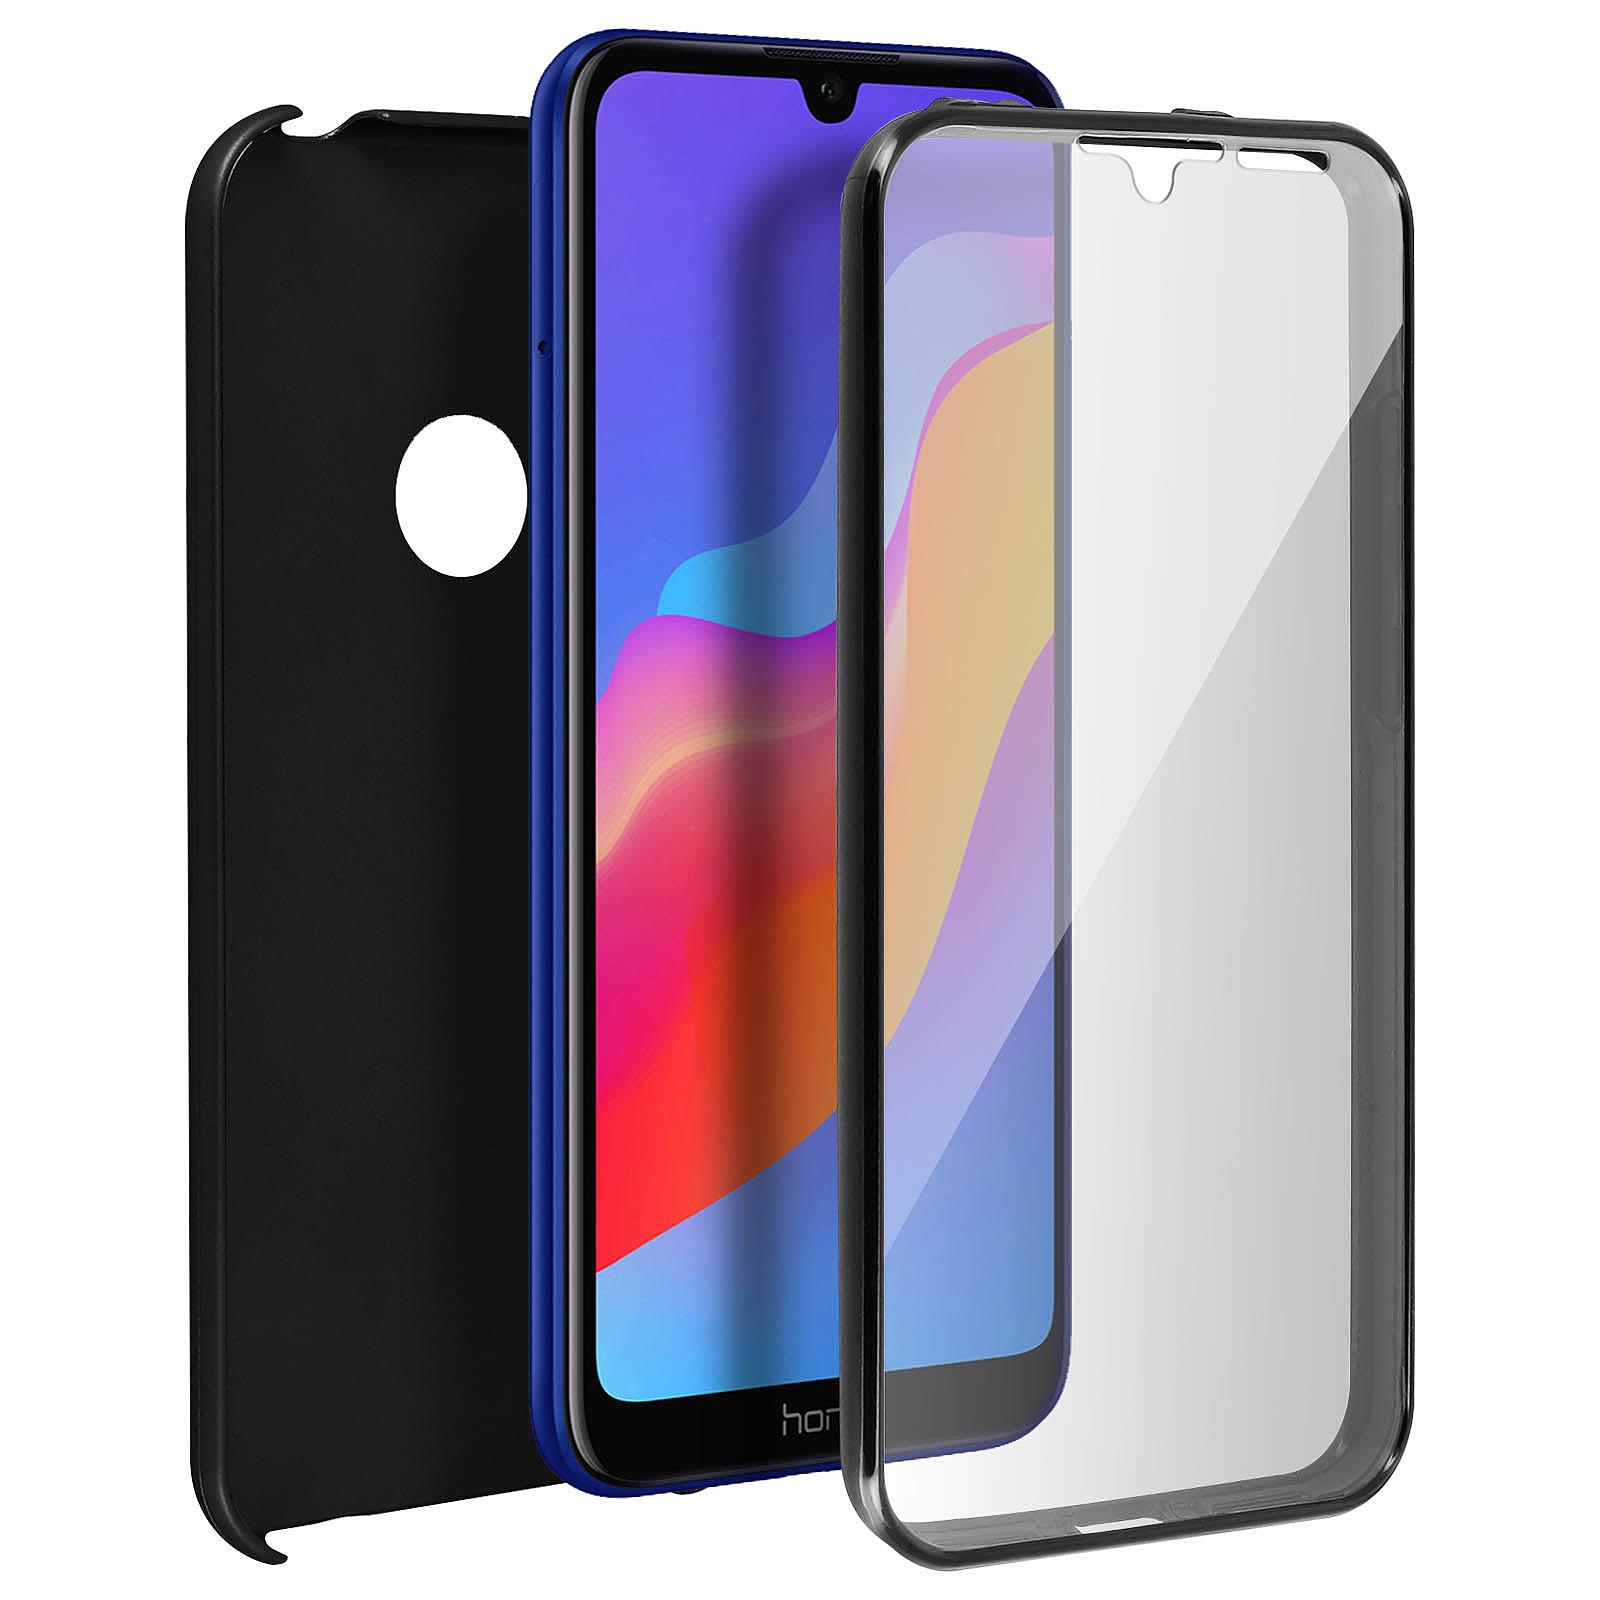 Avizar Coque Noir pour Huawei Y6 2019,Honor 8A